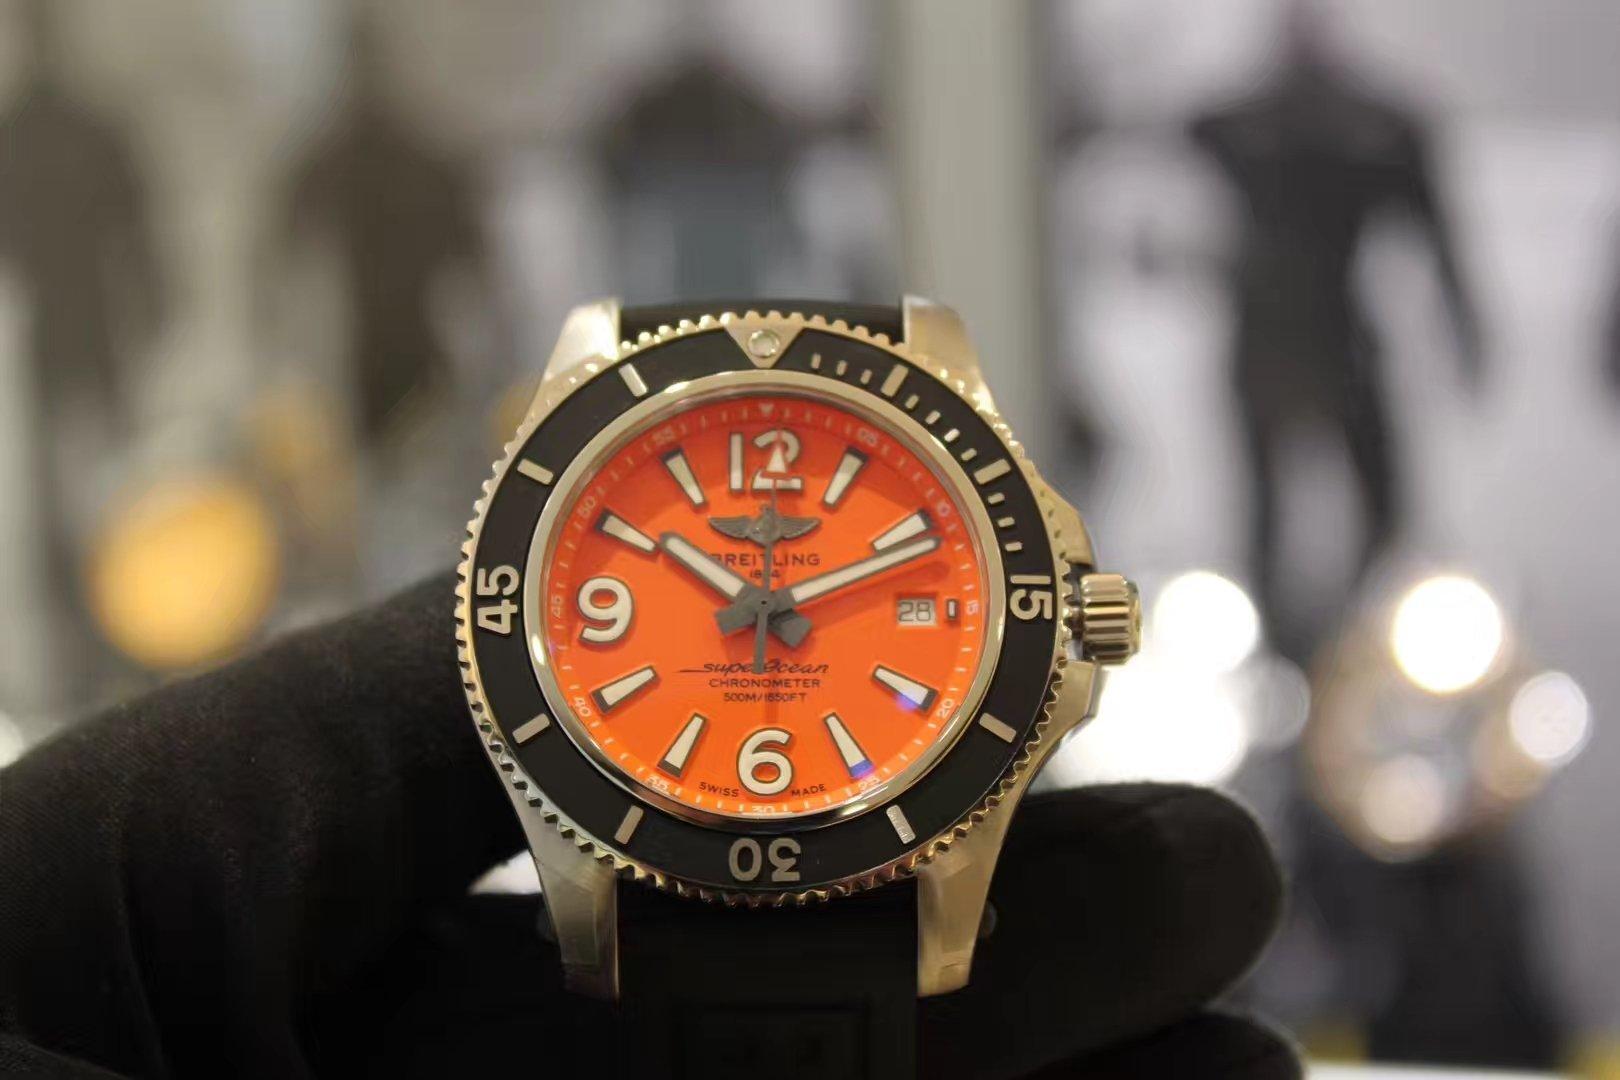 BREITLING百年灵Superoean超级海洋系列,潜水员专业潜水腕表插图1